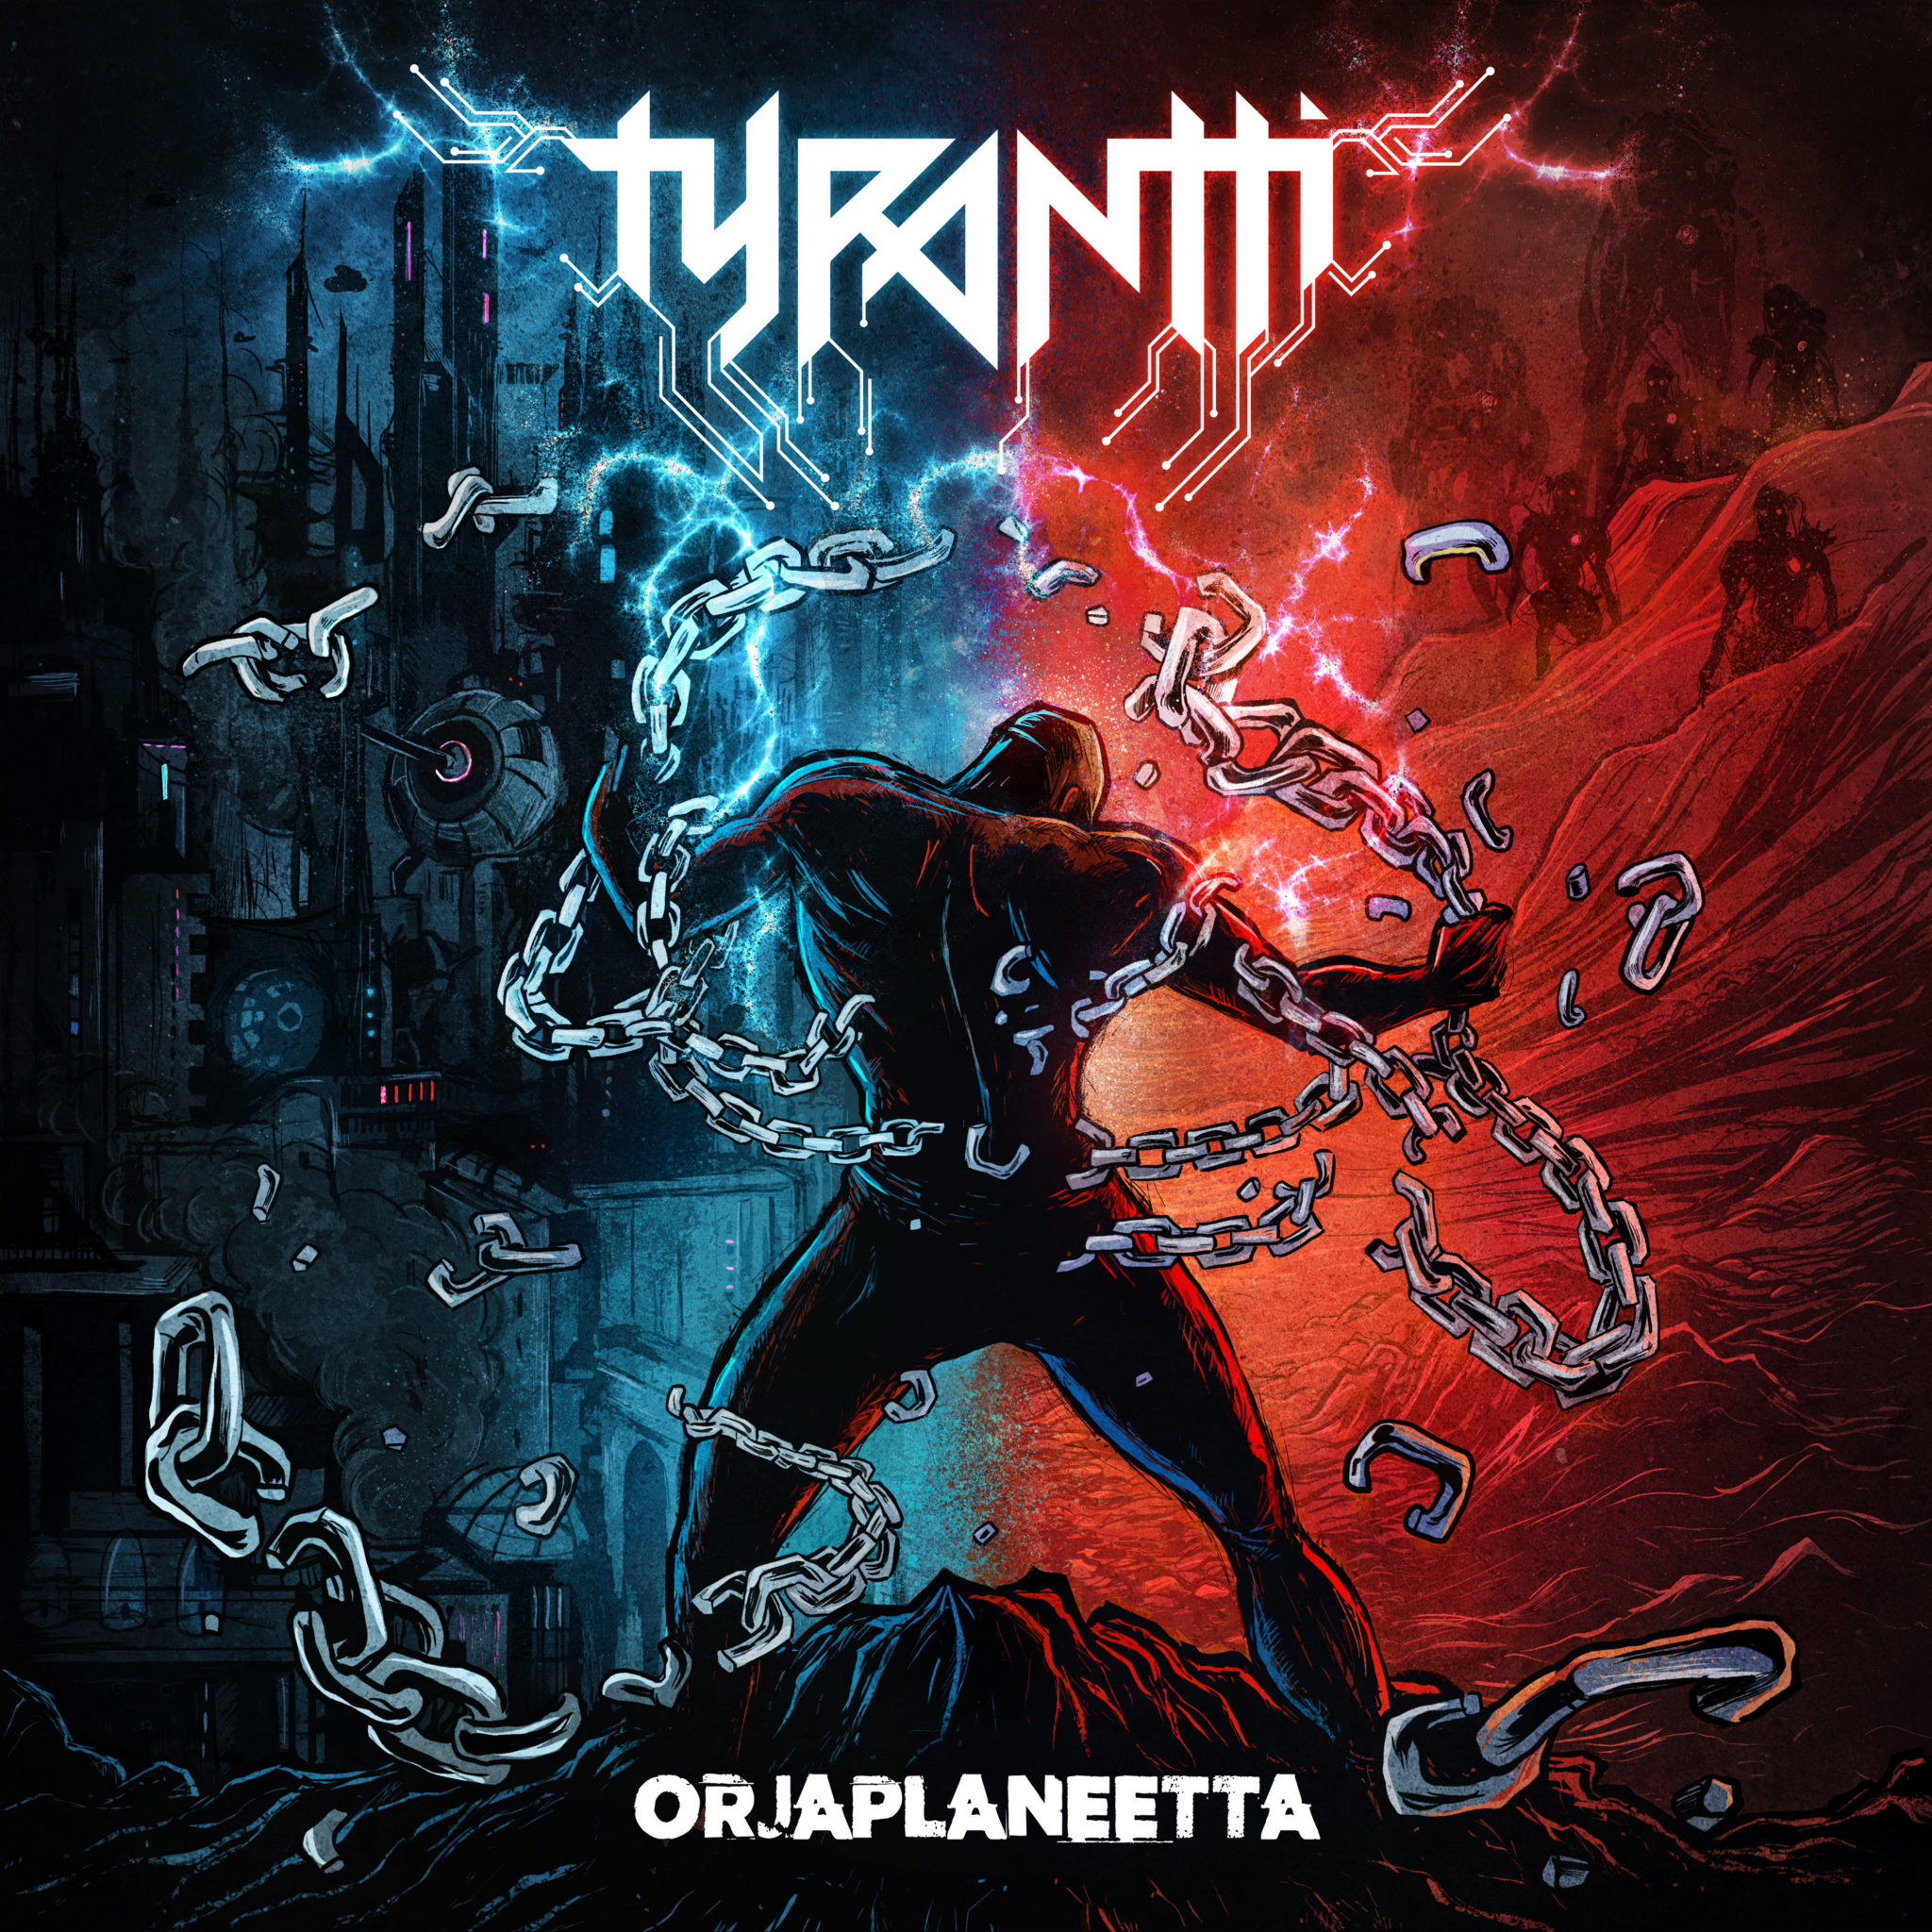 REVIEW: Tyrantti – Orjaplaneetta